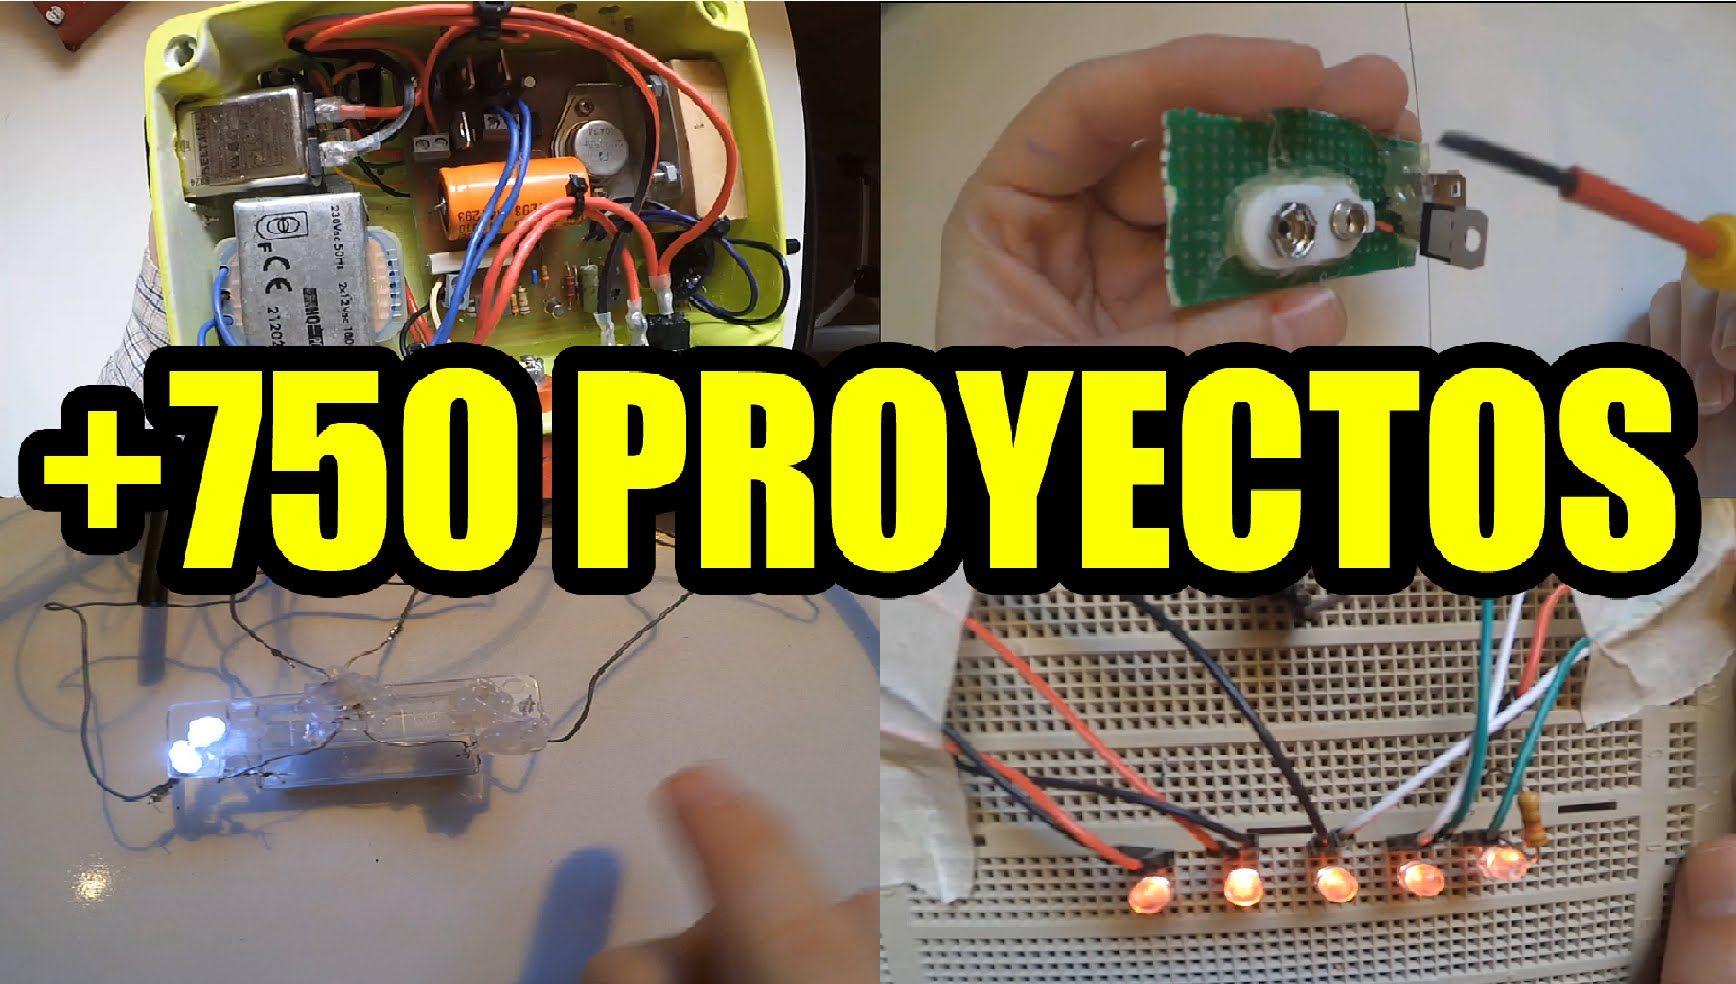 Proyectos Electronicos Faciles De Hacer 750 Proyectos Proyectos Electronicos Electrónica Proyectos De Mecatronica